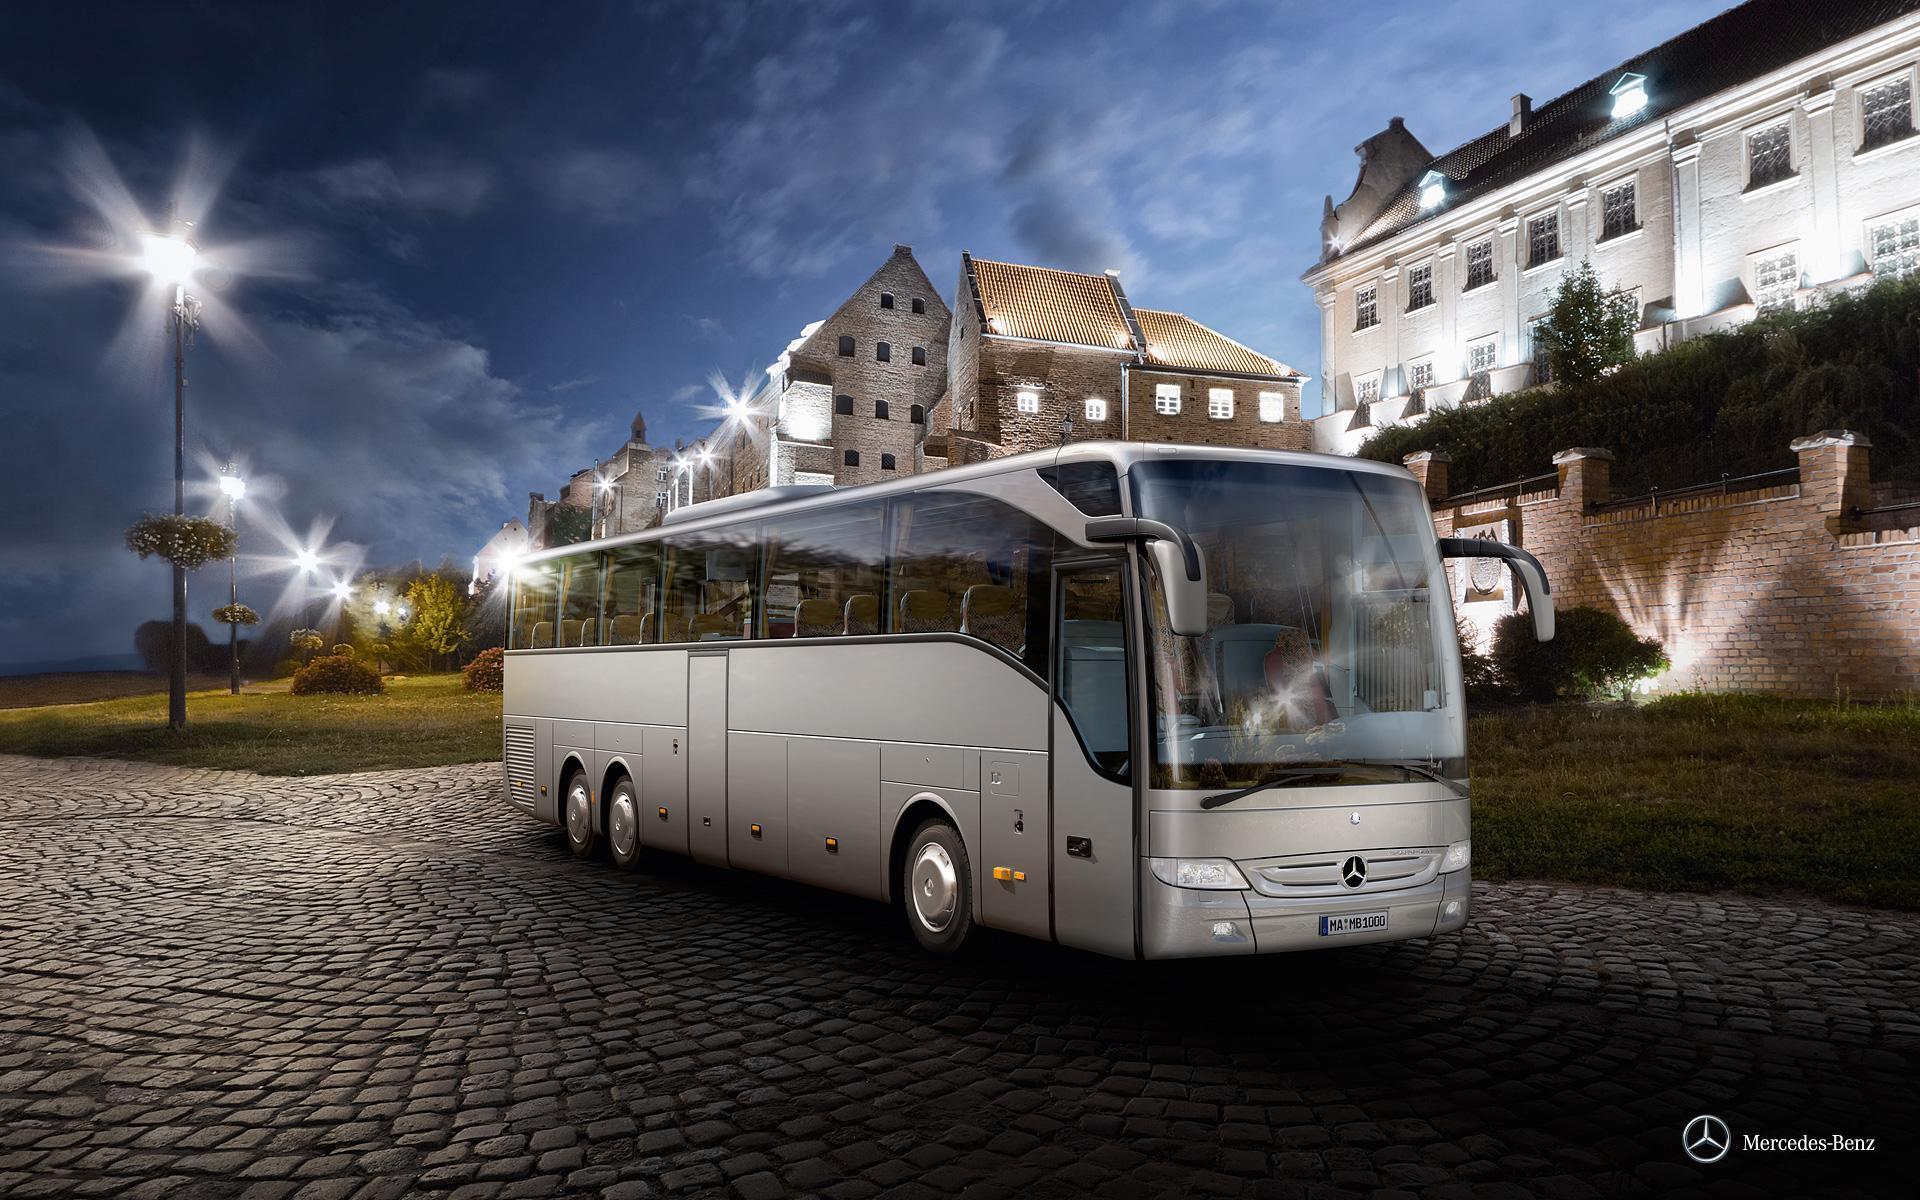 plecari-oriunde-in-europa-cu-autocarul